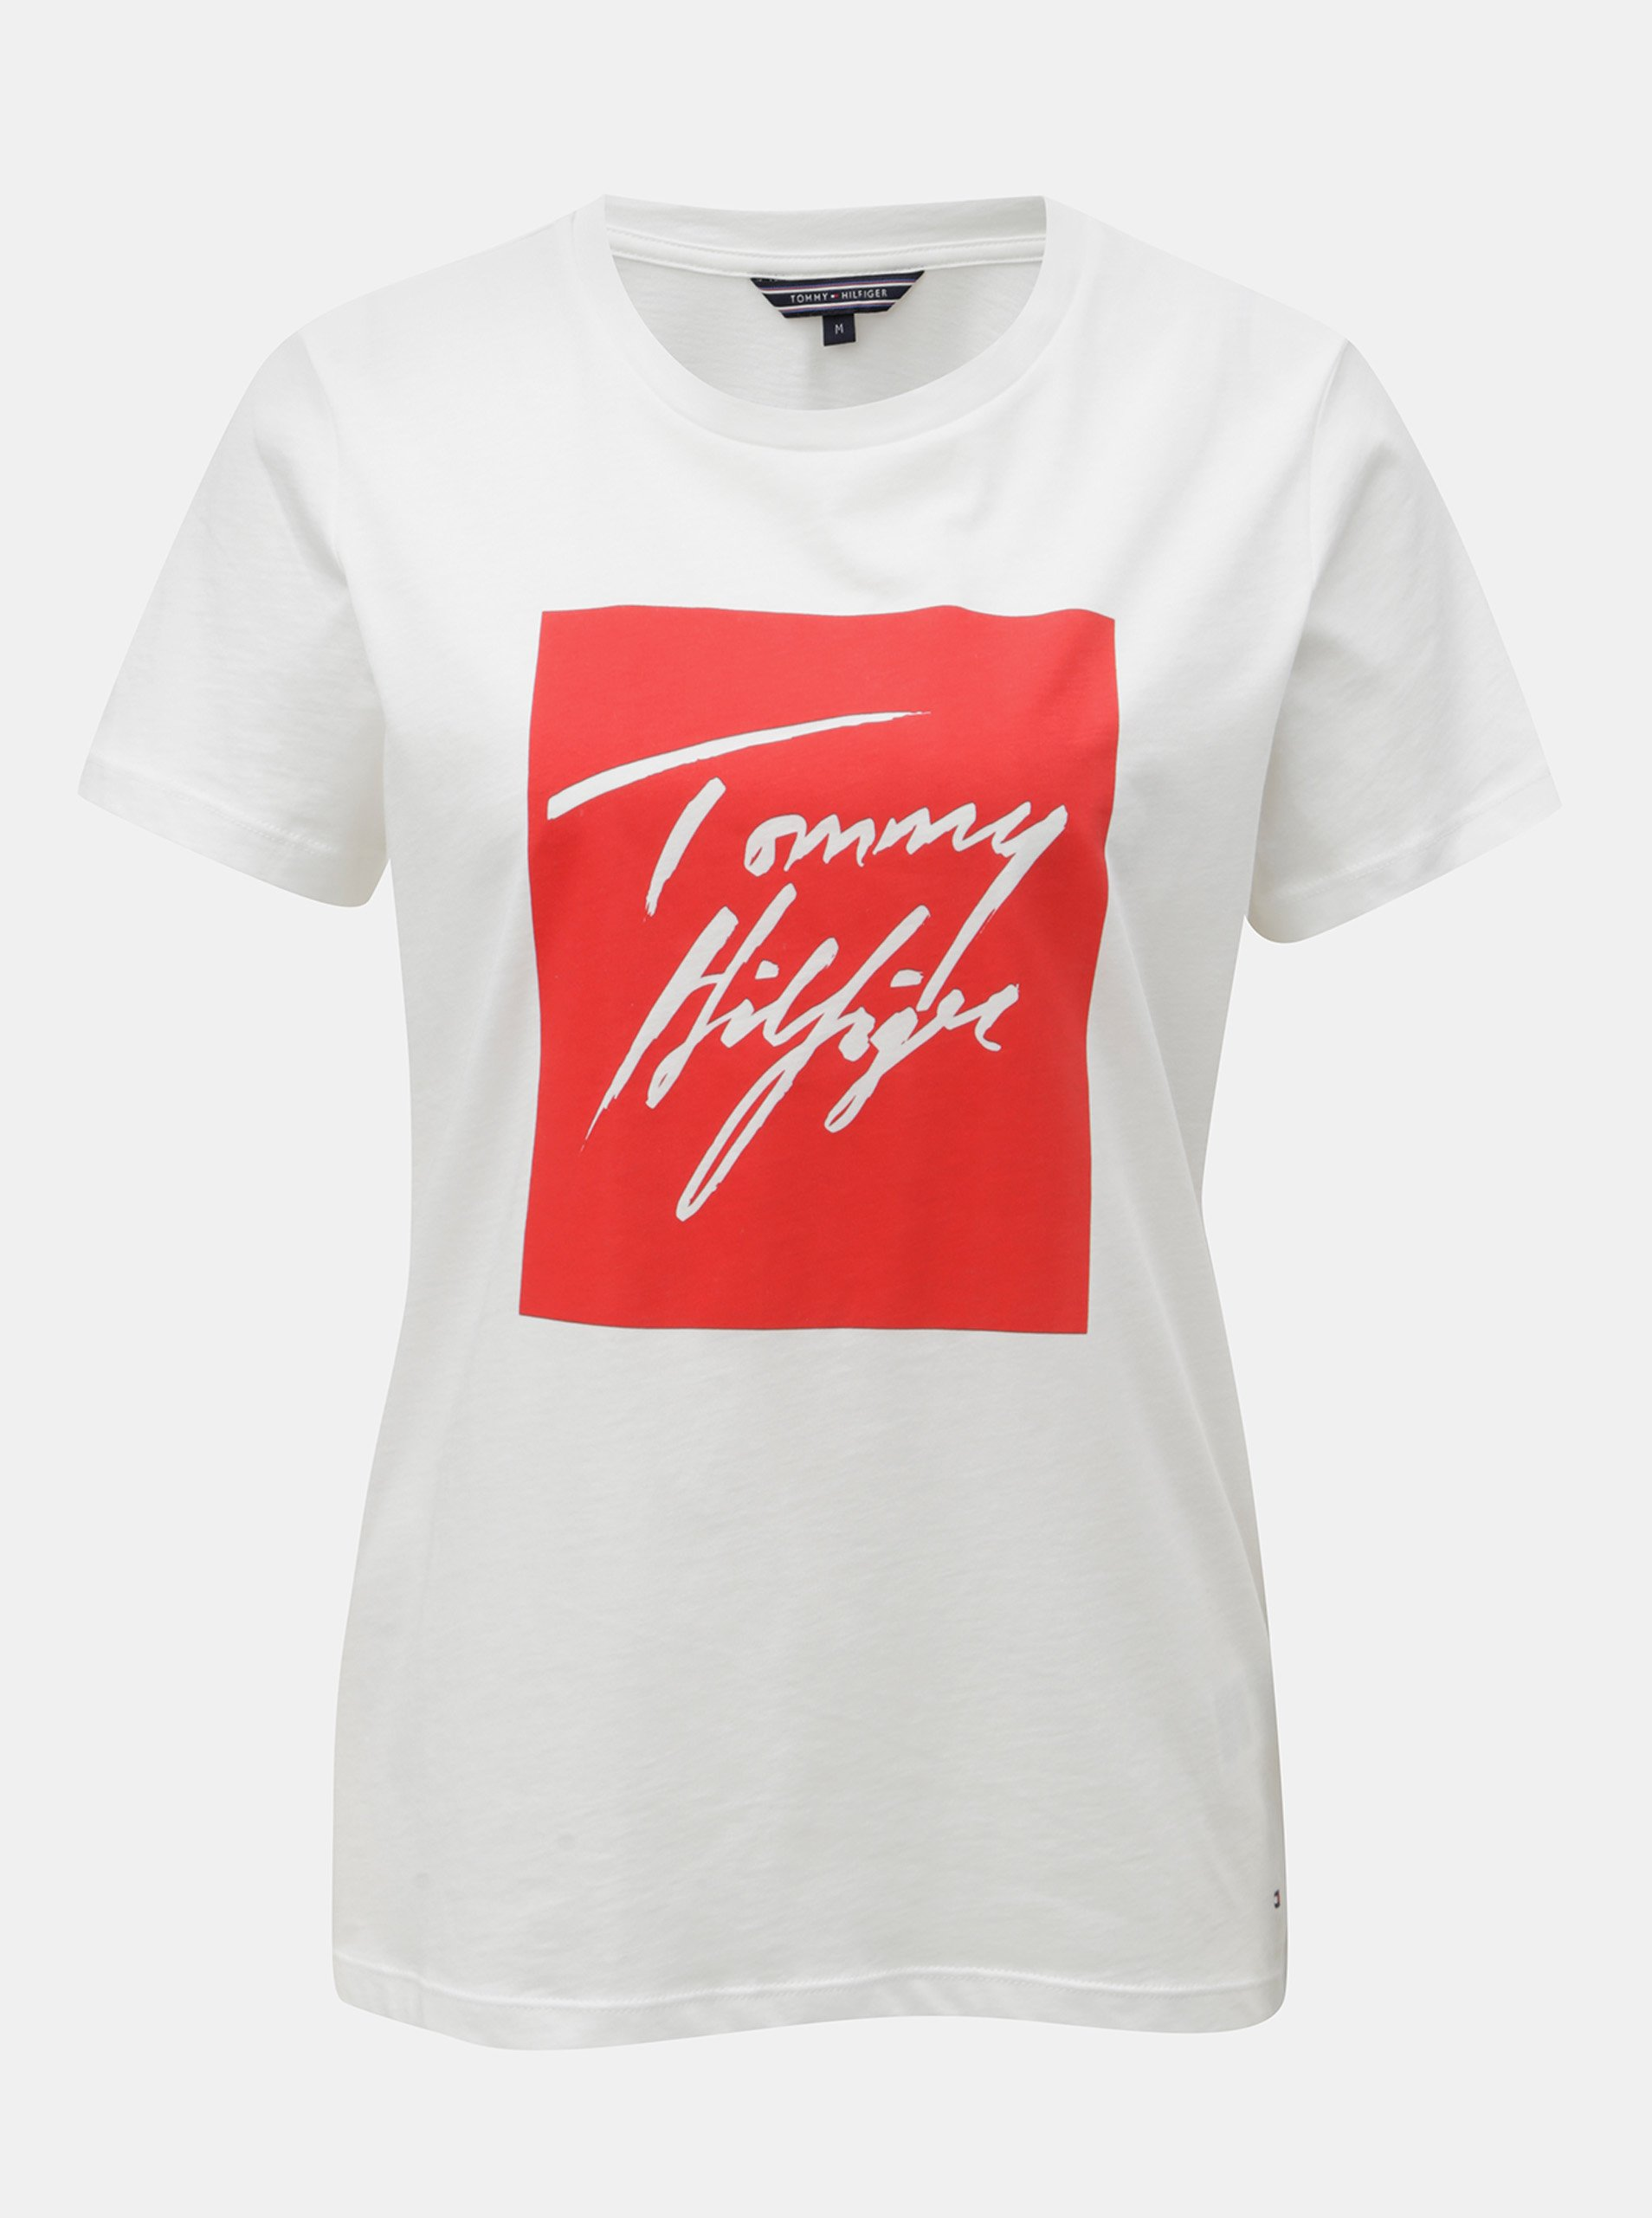 e3efd5d853d Biele dámske tričko s potlačou Tommy Hilfiger Effy